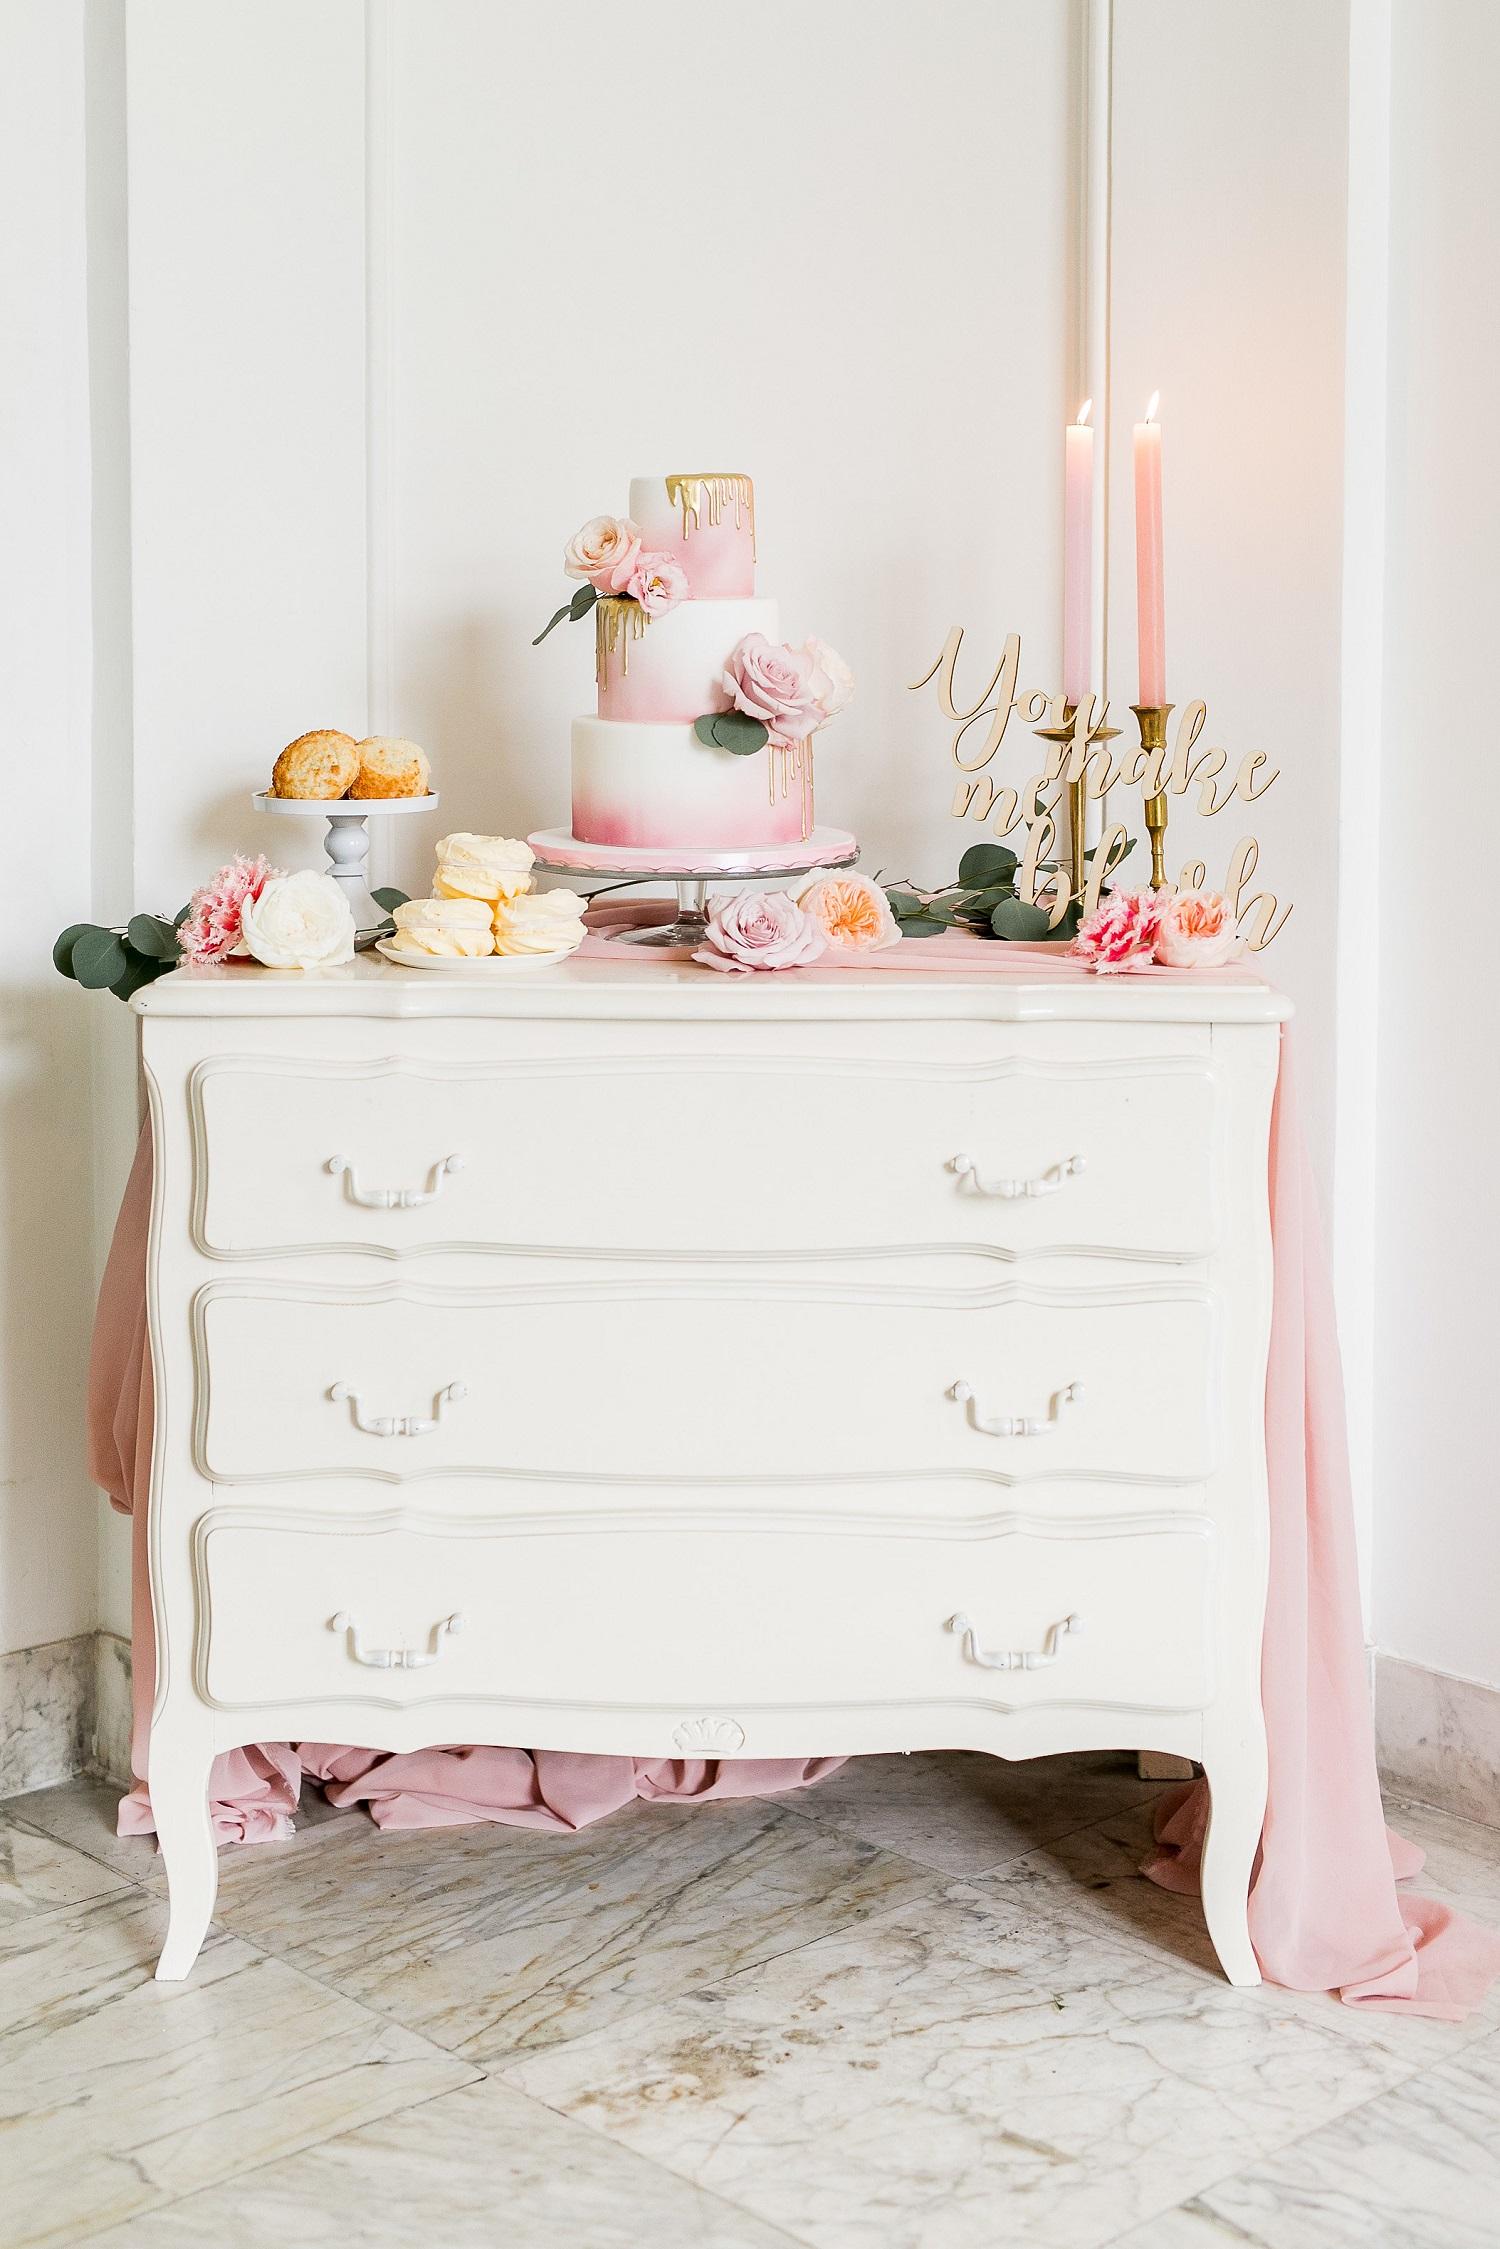 Sweet table op je bruiloft - Jasmijn Brussé Fotografie